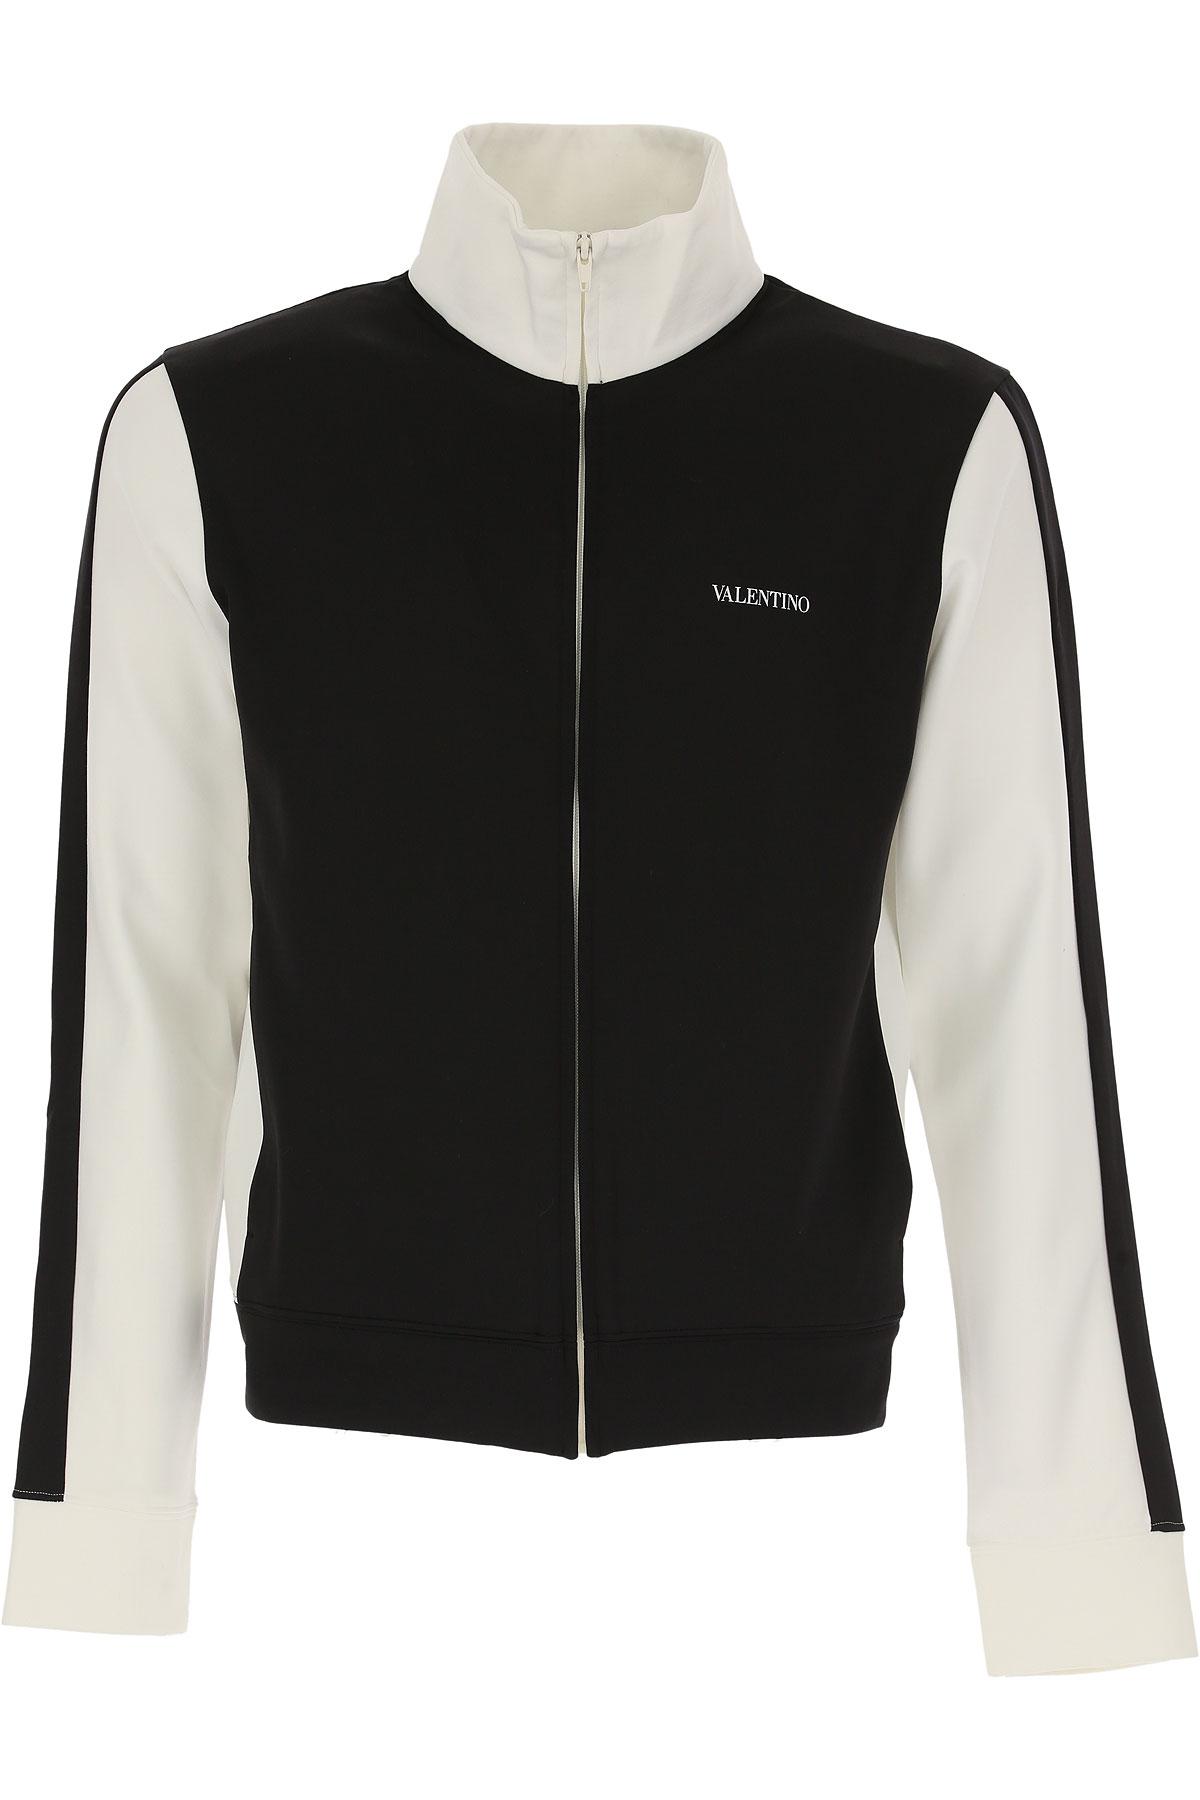 Valentino Sweatshirt for Men, Black, polyamide, 2017, L M XL USA-472832